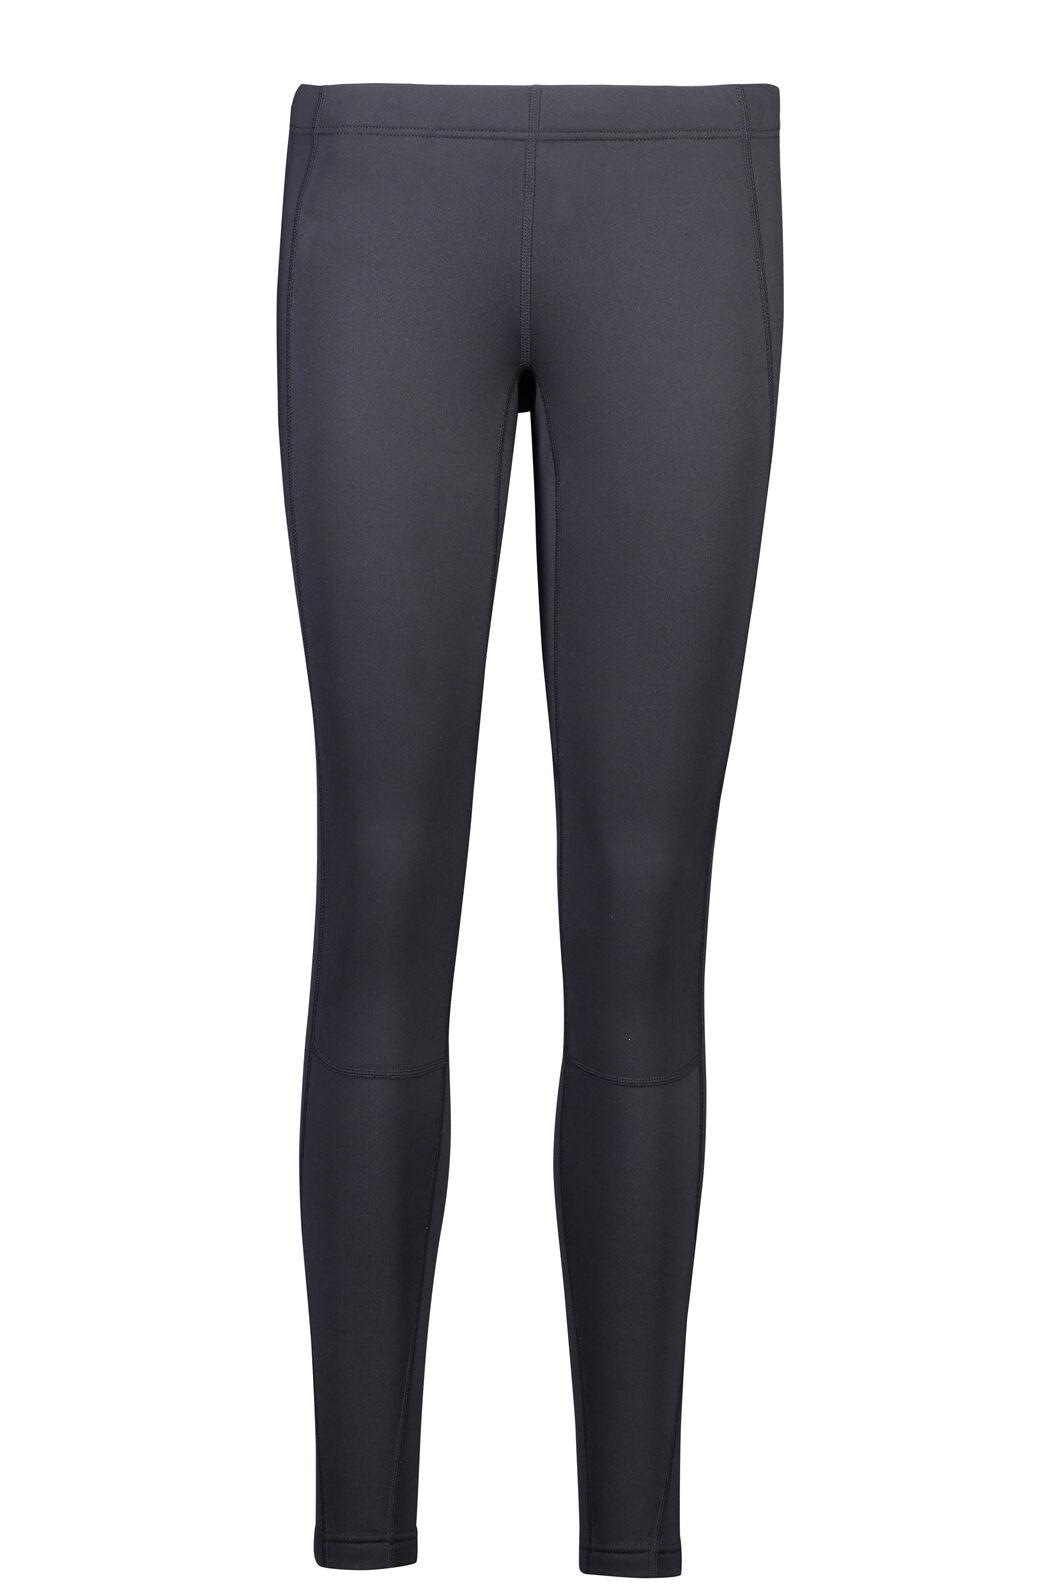 Traverse Fleece Tights - Women's, Black, hi-res